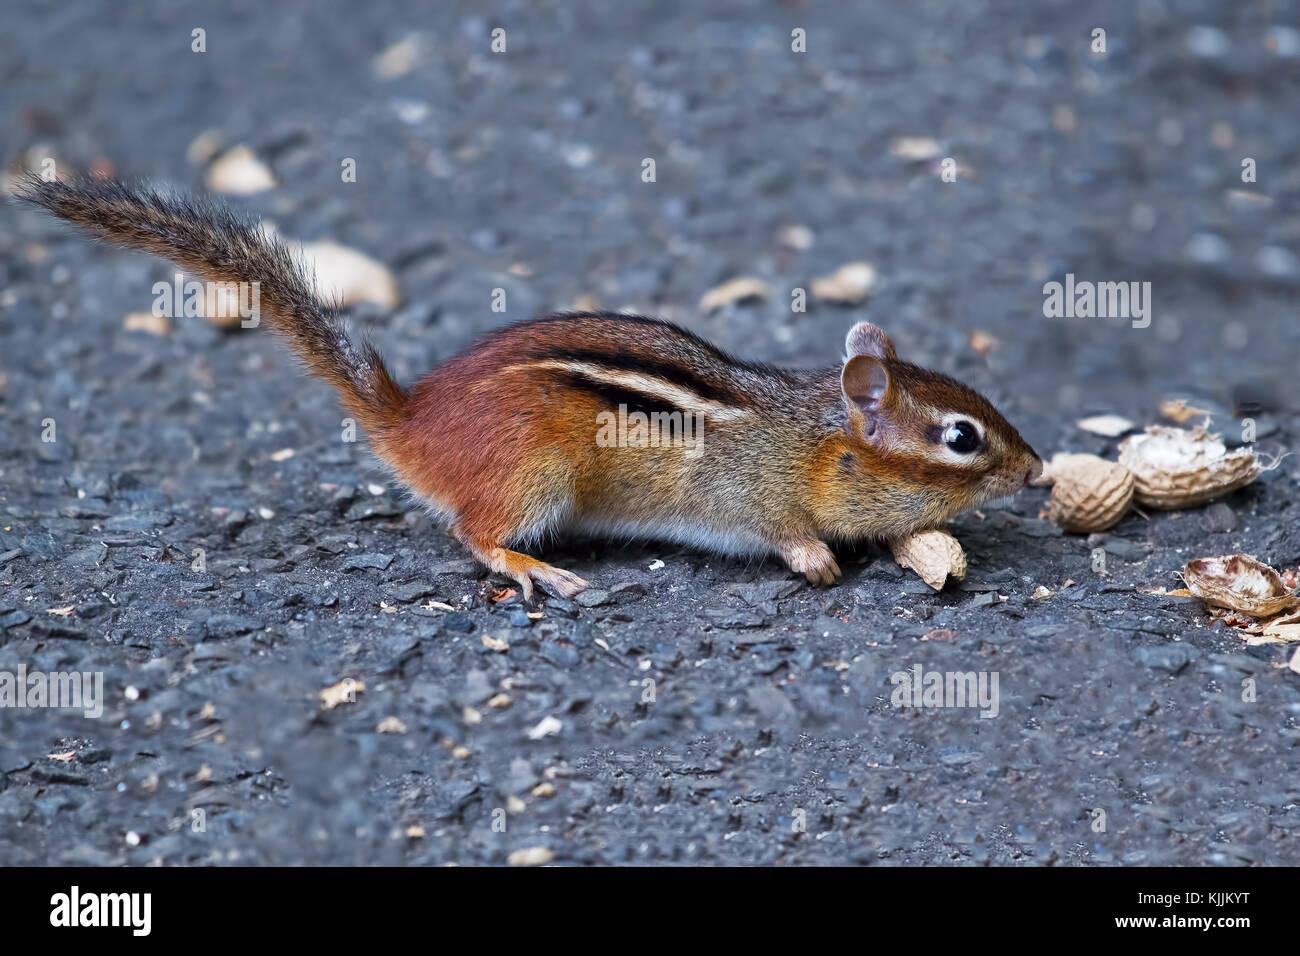 Chipmunk Eating Peanuts - Stock Image